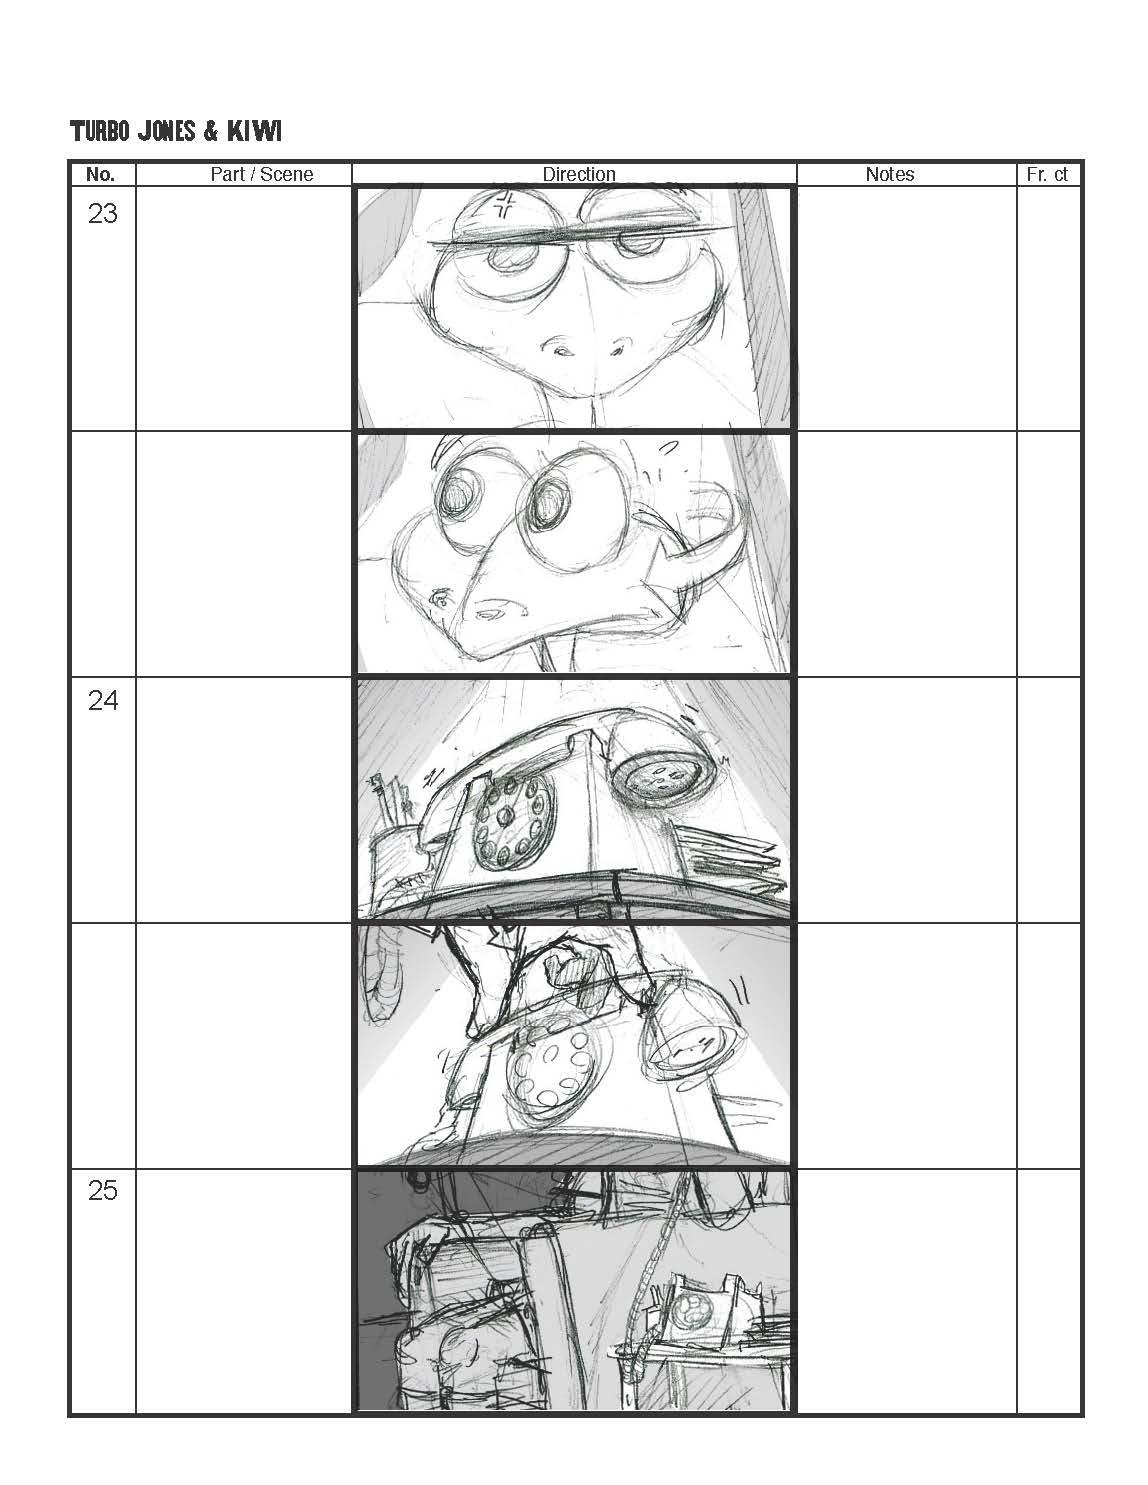 TJK_Storyboards_v01_HIGH_Page_12.jpg